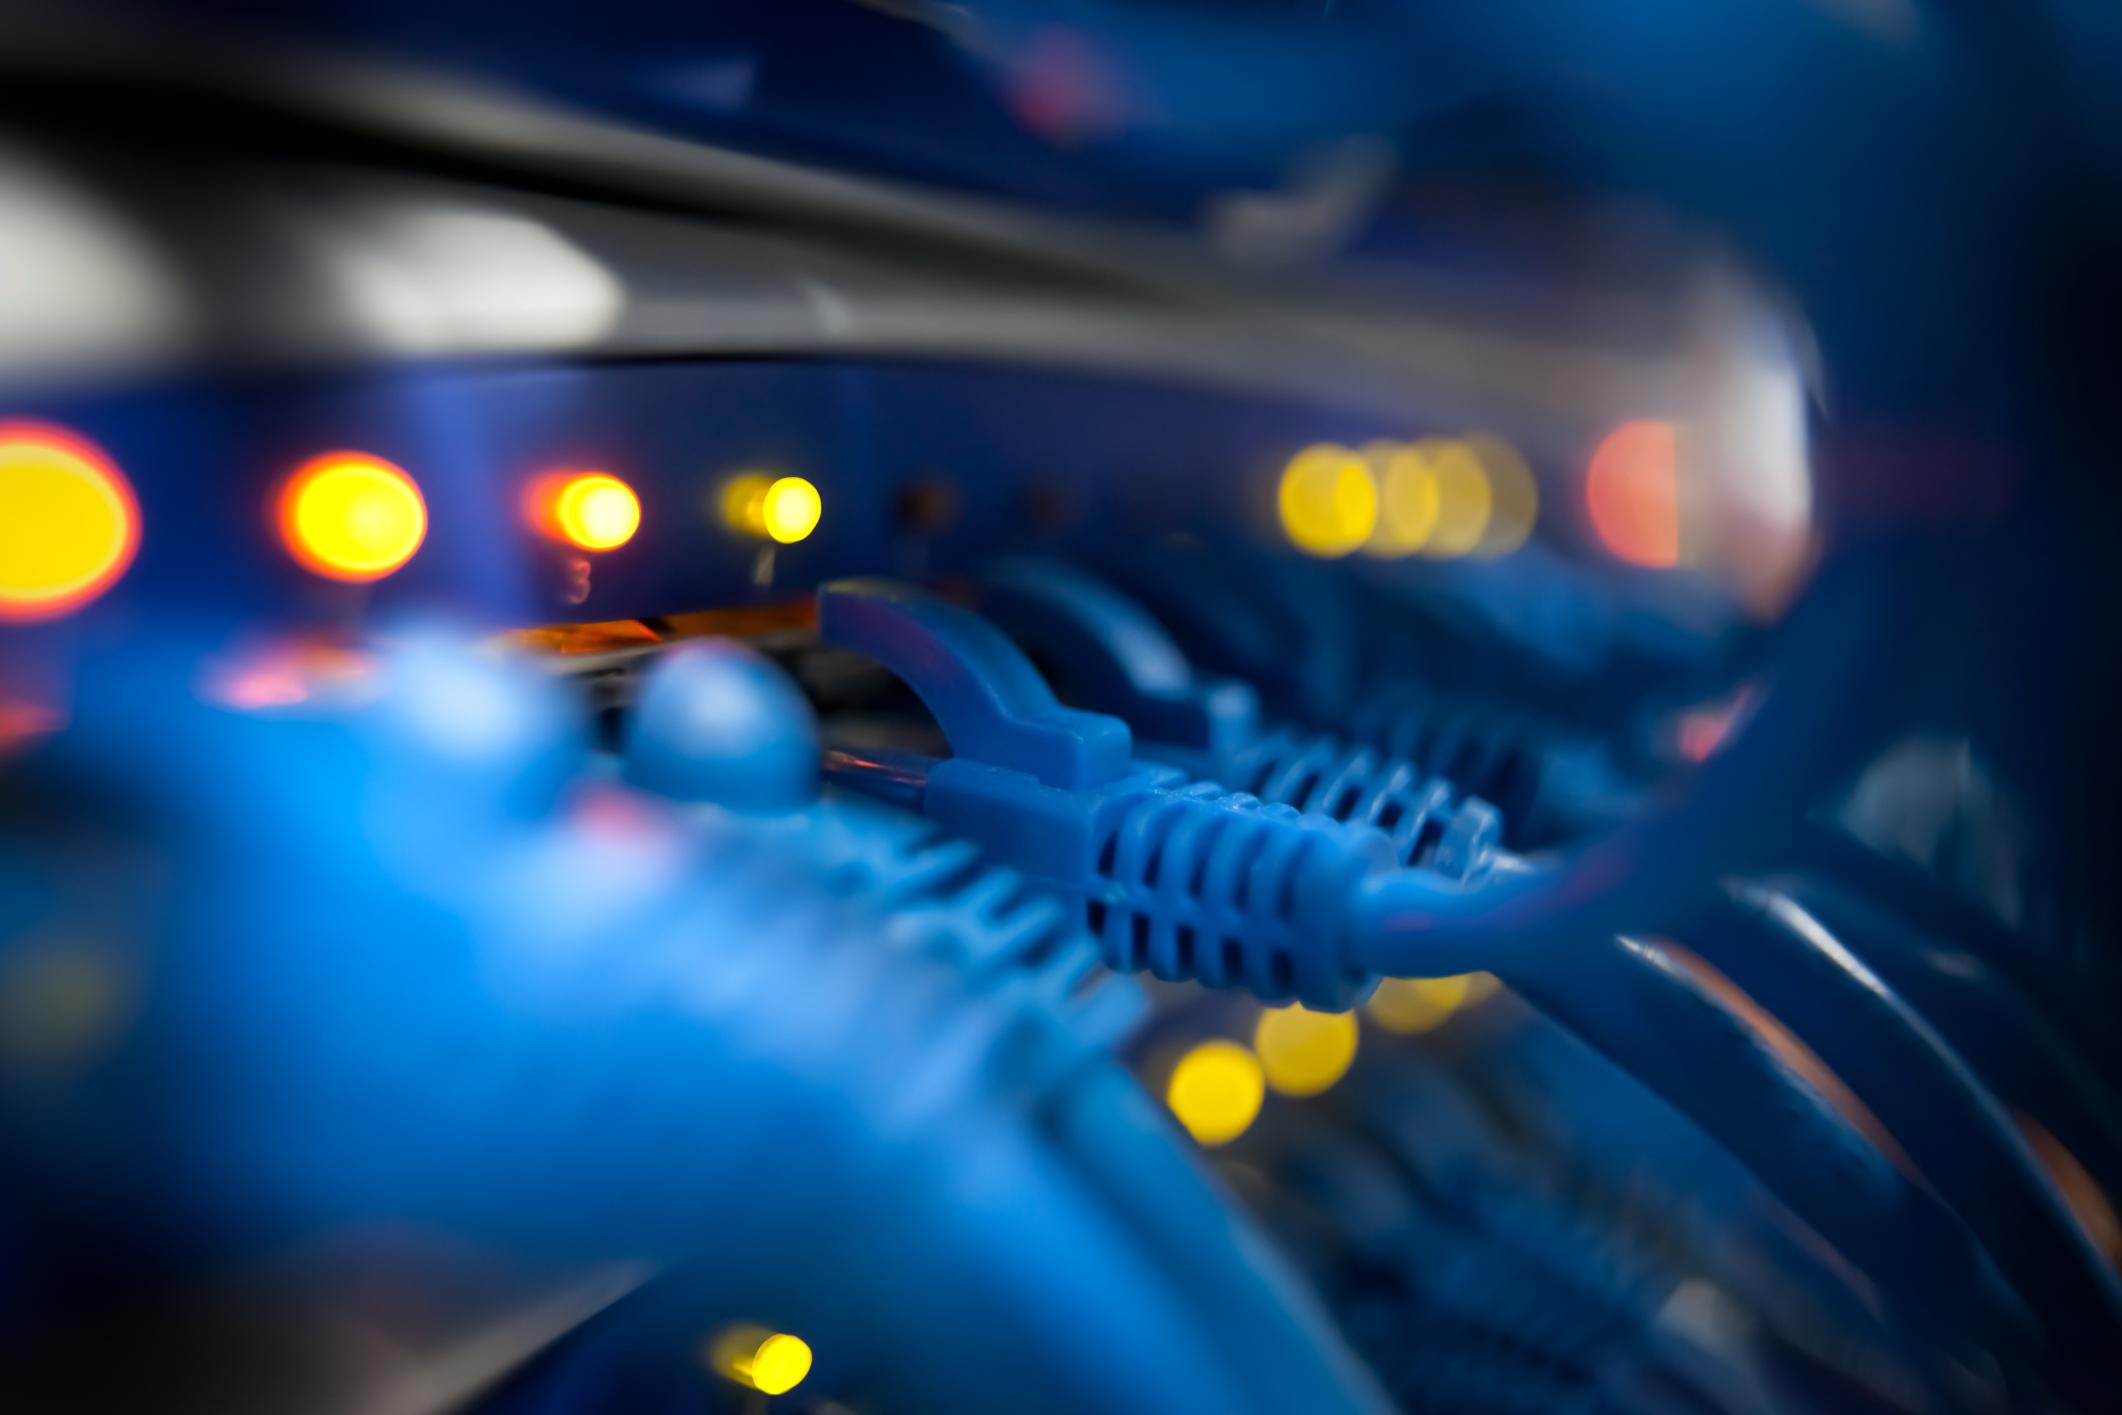 Closeup Of A Server Network Panel